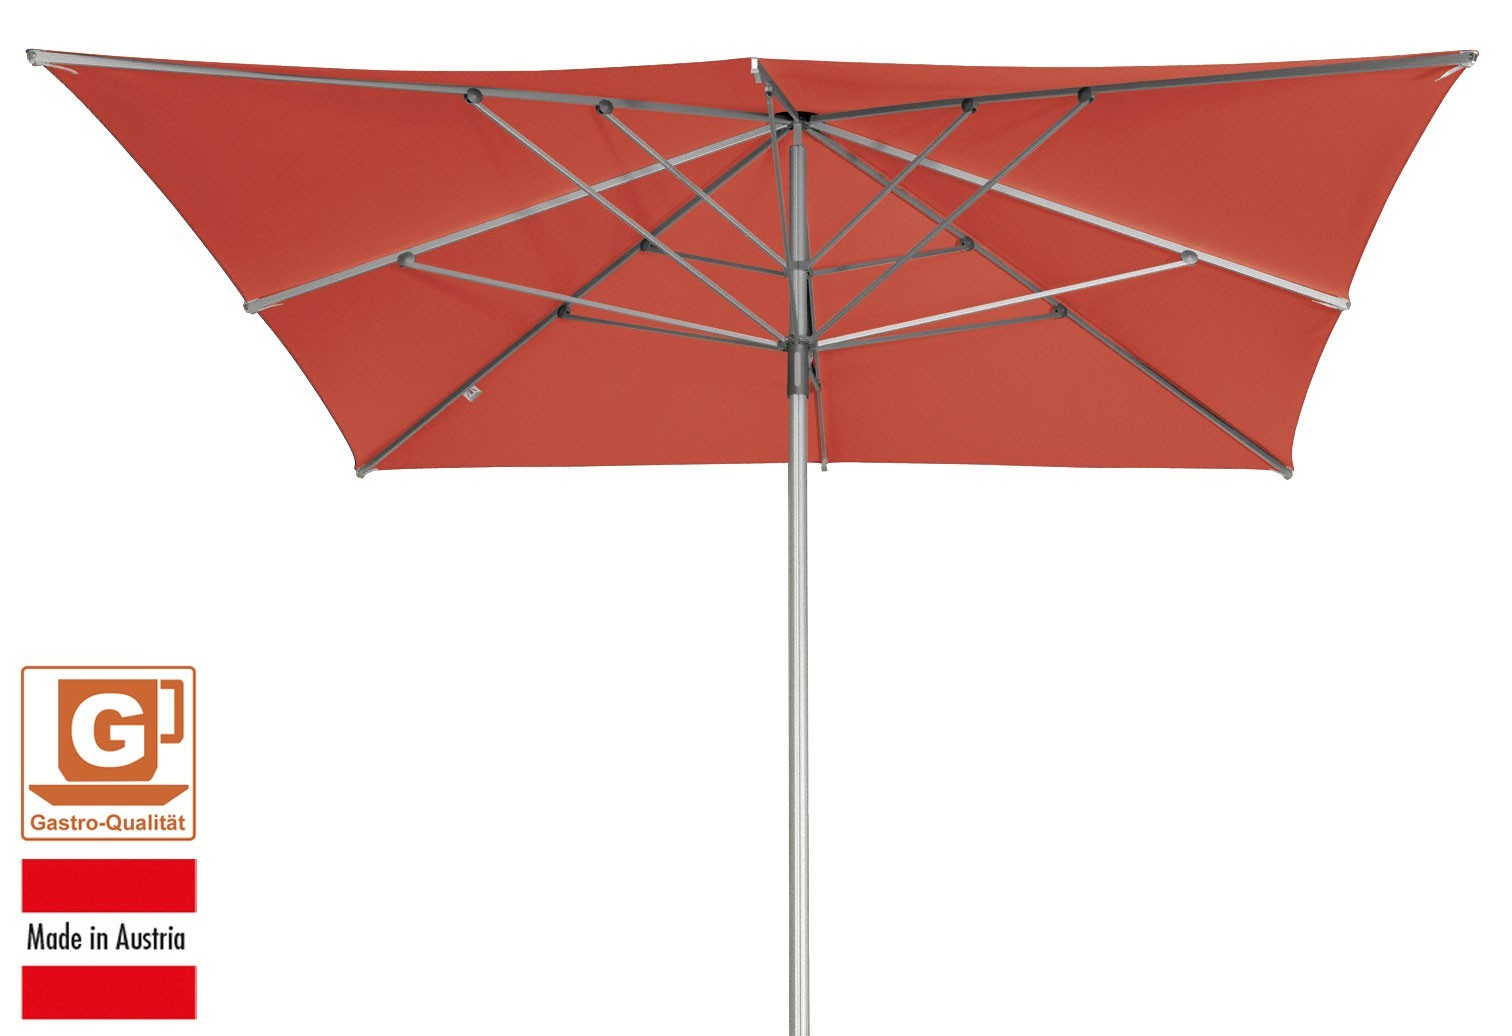 gro schirm sonnenschirm doppler alu expert 350x350cm terracotta bei. Black Bedroom Furniture Sets. Home Design Ideas